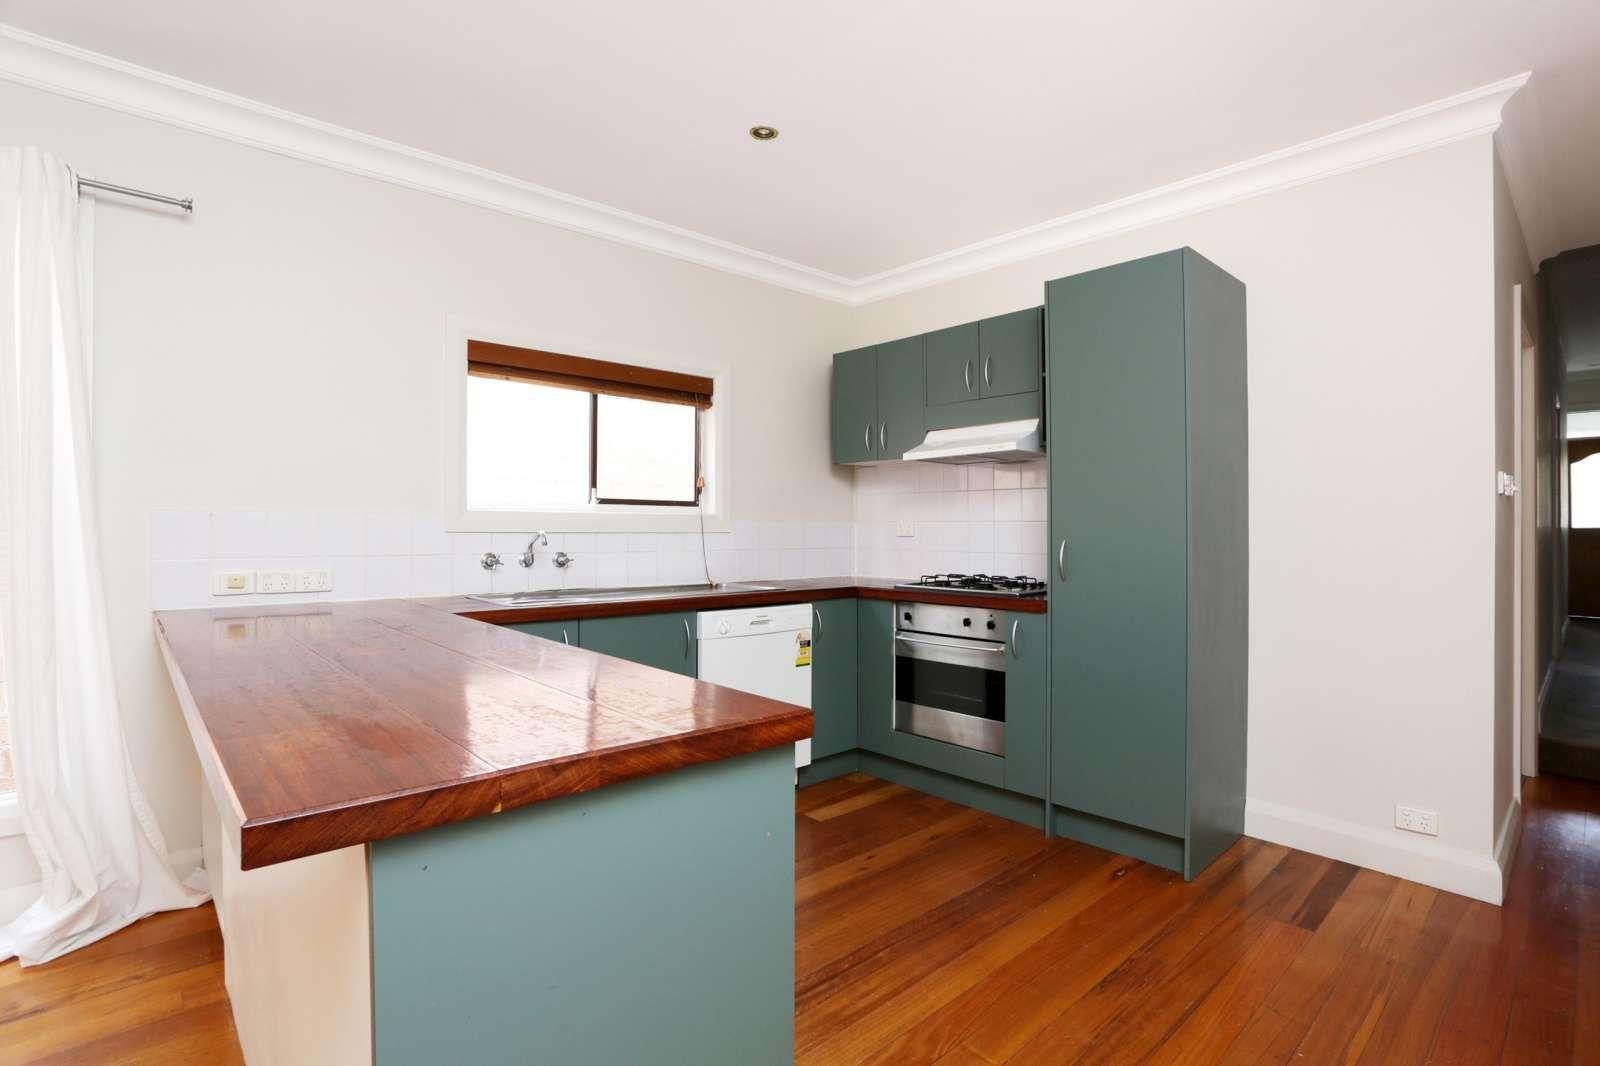 38 Curran St, North Melbourne VIC 3051, Image 1